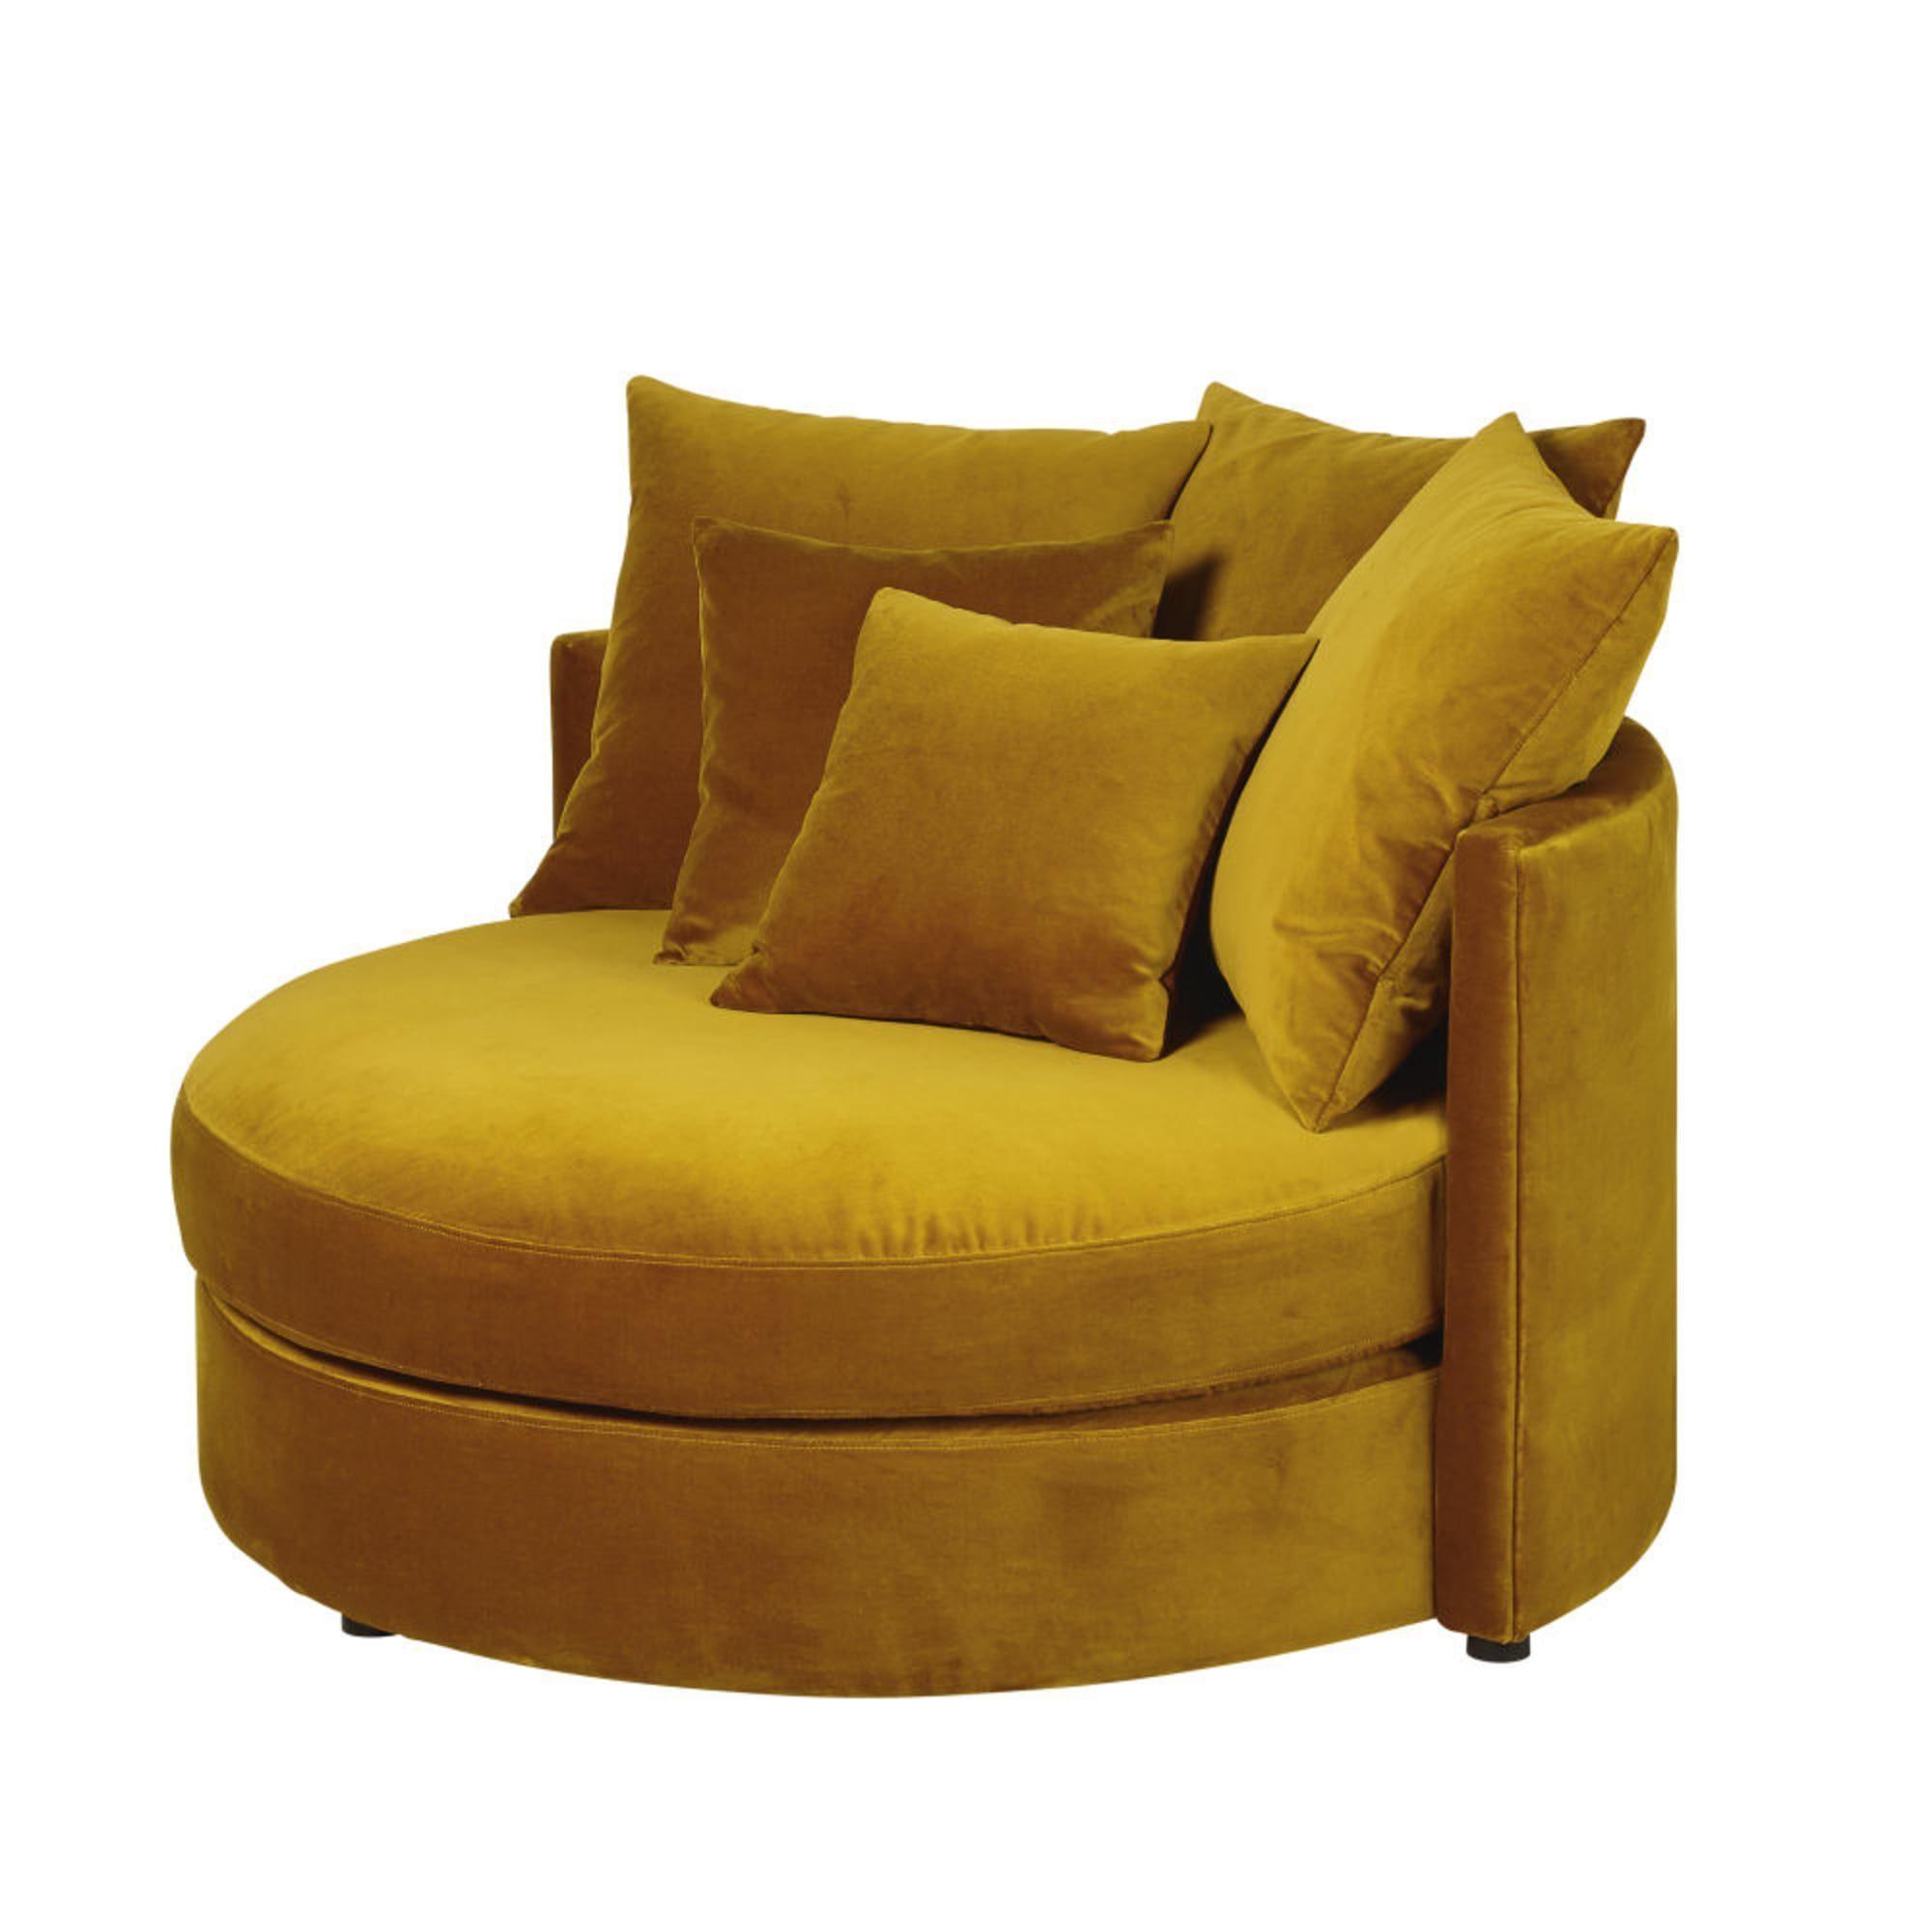 Rundes 1 2 Sitzer Sofa Mit Samtbezug Senfgelb En 2020 Amarillo Mostaza Amarillo Mostacilla